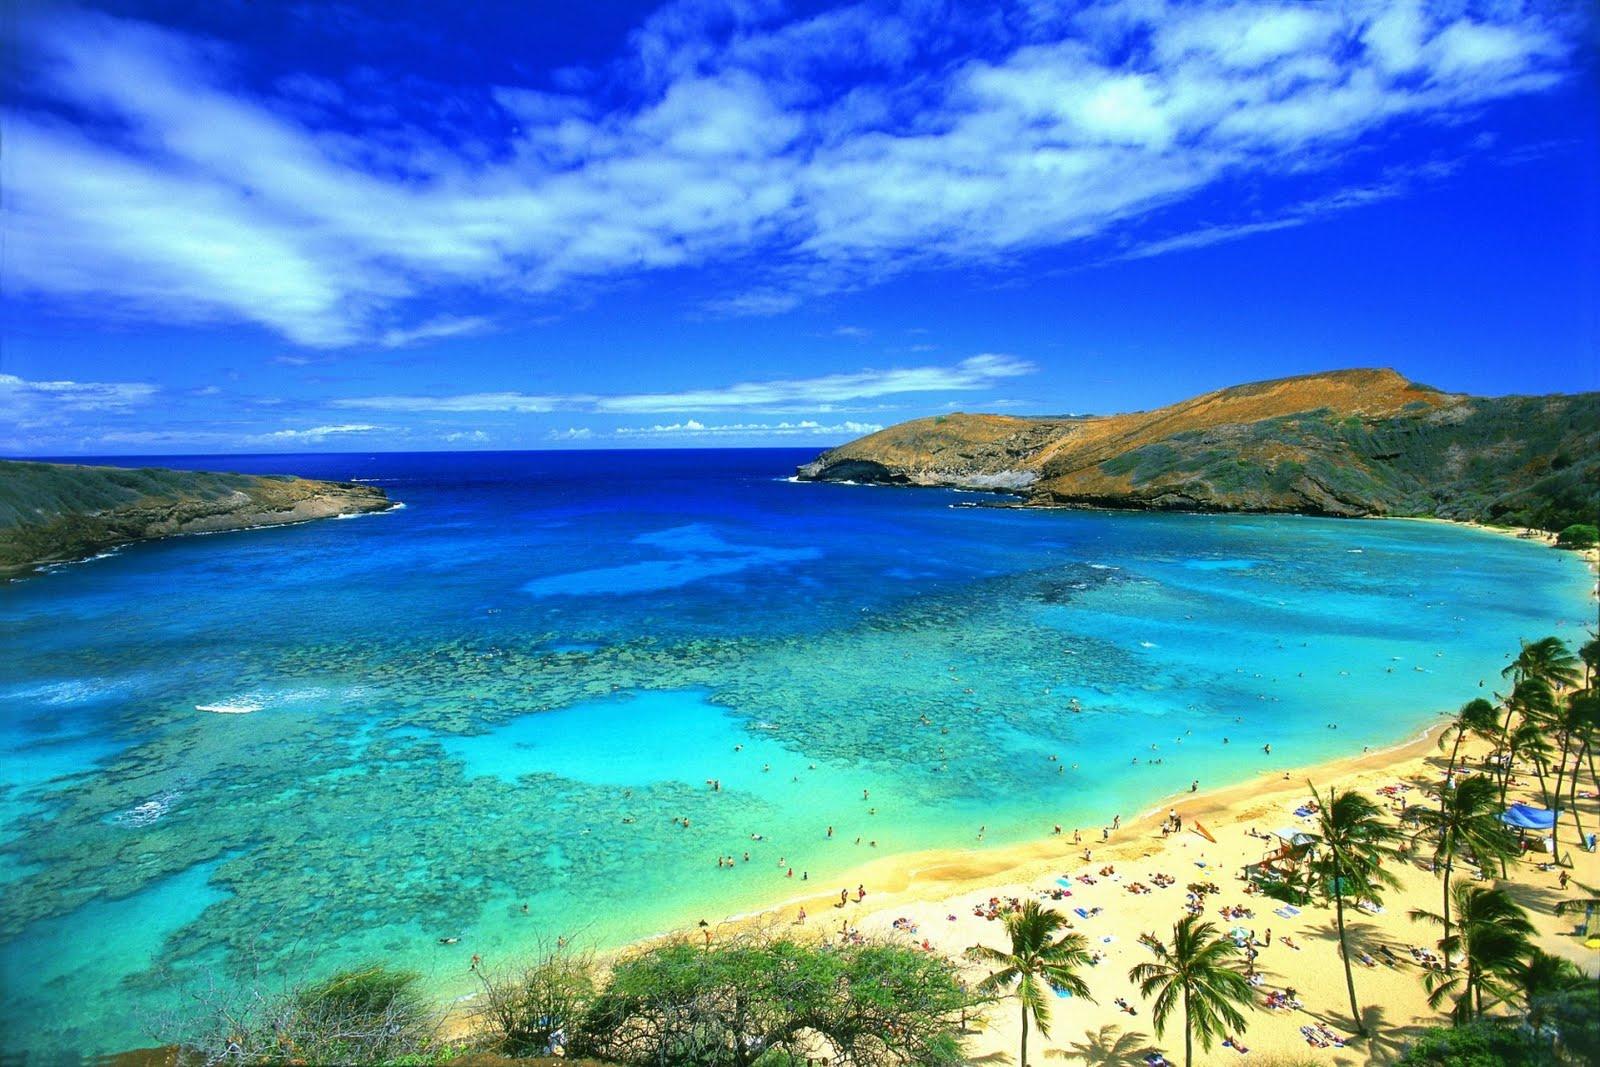 http://1.bp.blogspot.com/_4c4umiCddtA/TE-J6oY1uJI/AAAAAAAAFEs/FbfUaD-PIoI/s1600/paradise-beach-wallpapers_8916_1680x1050.jpg